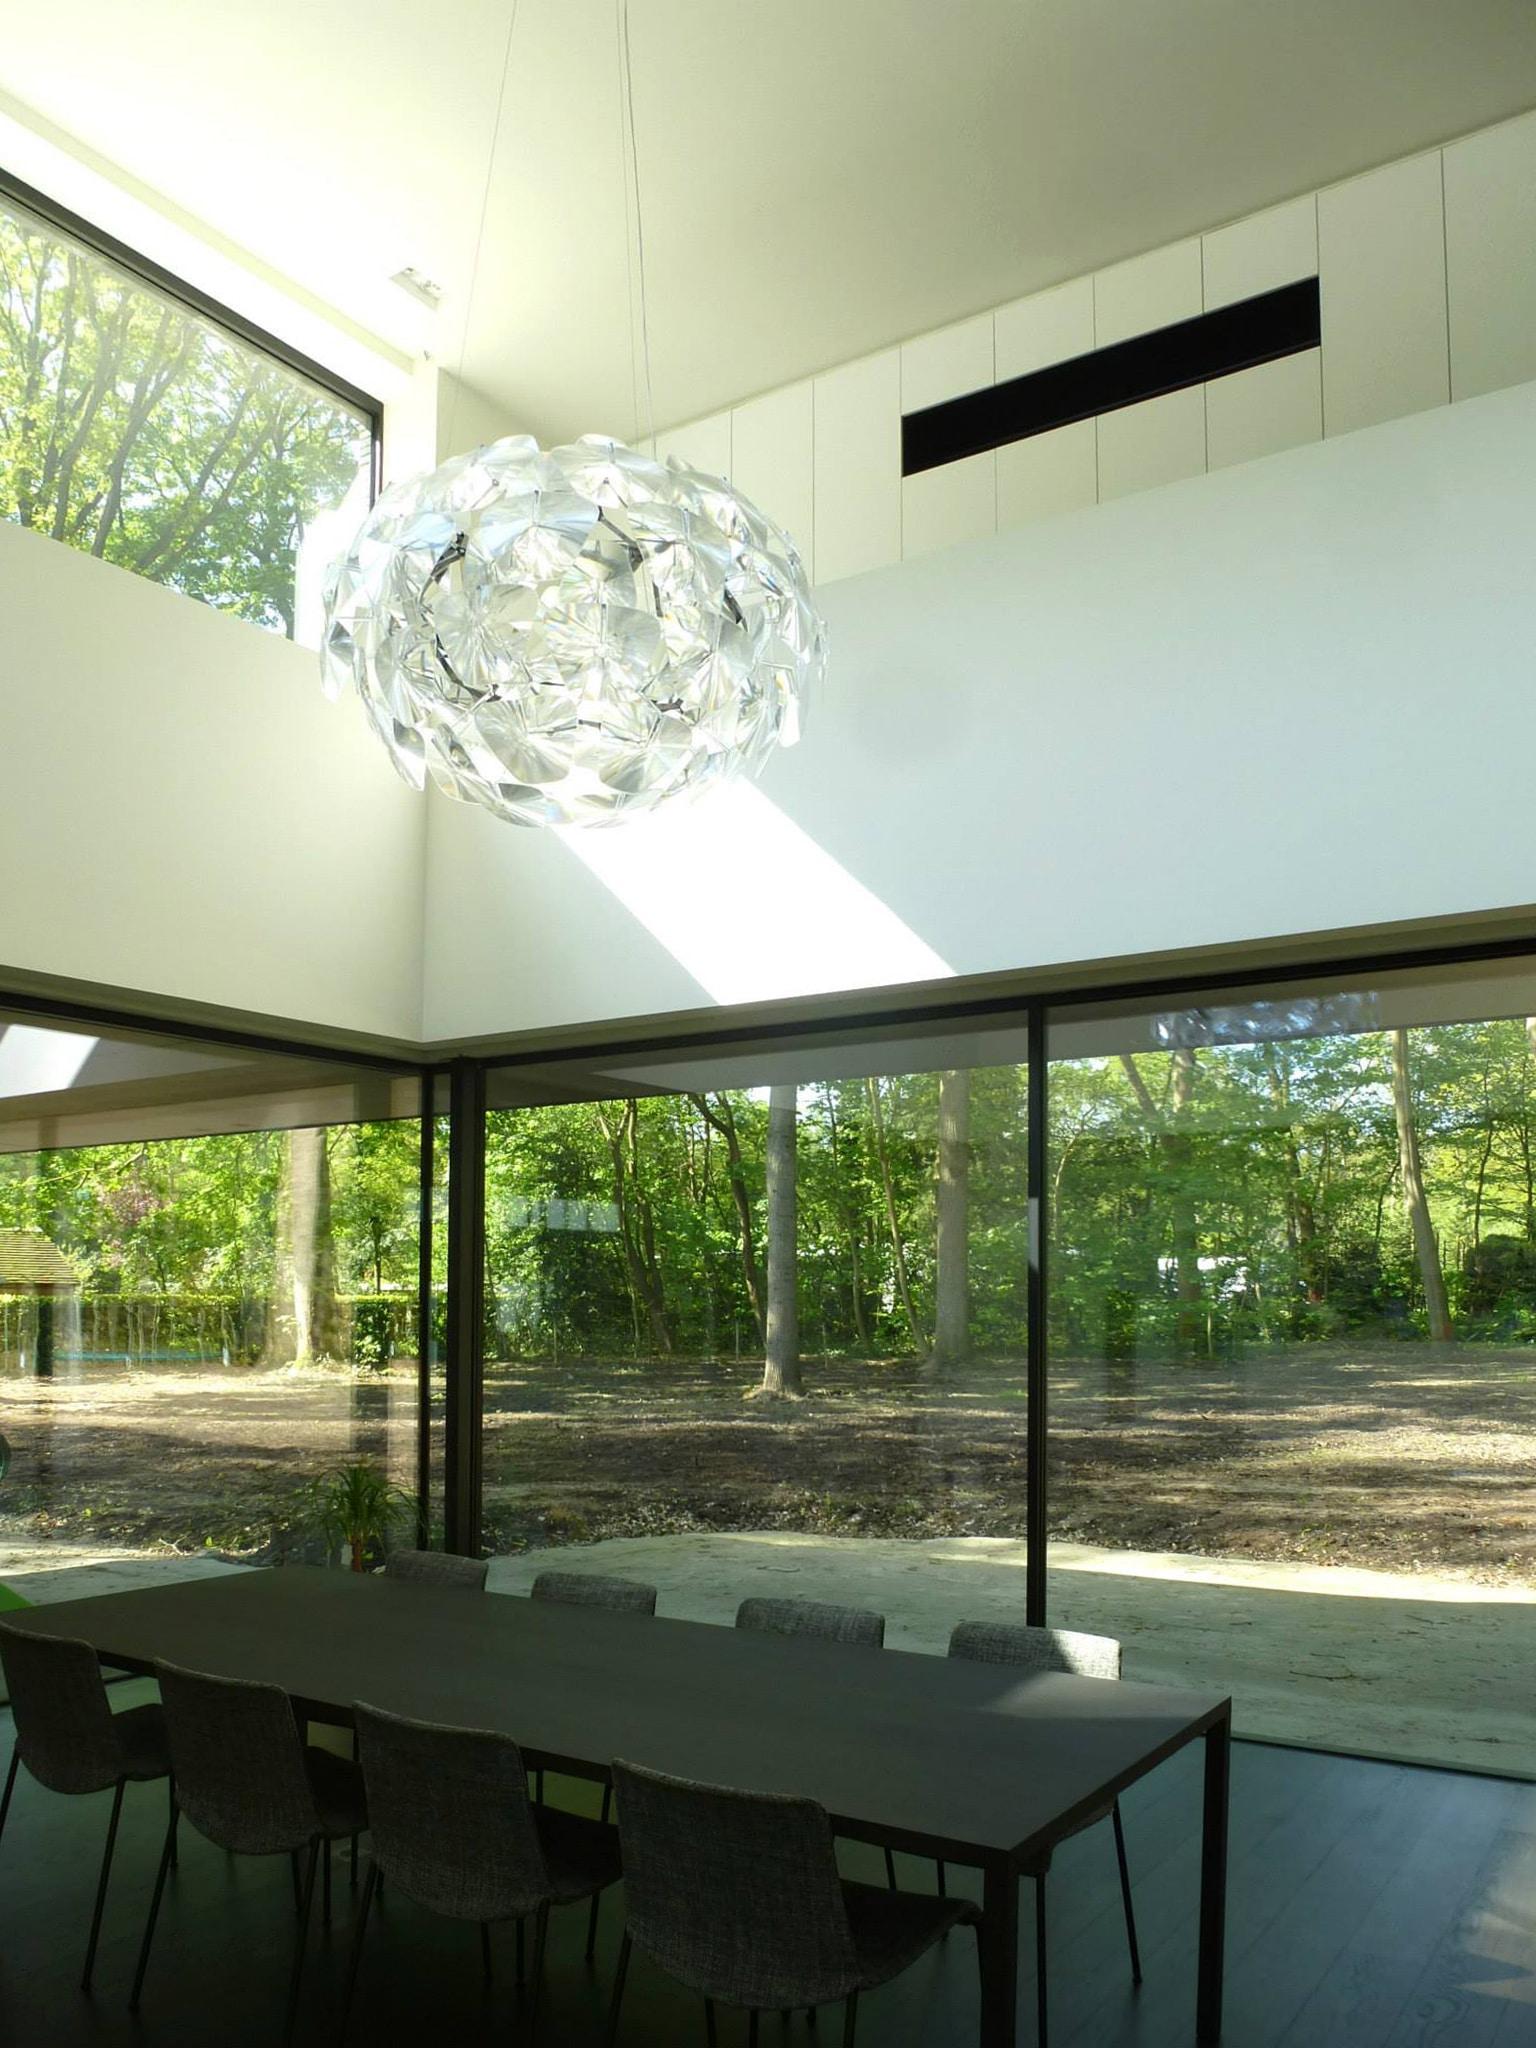 10271260 628031007274777 8357313924192333566 o | Baeyens & Beck architecten Gent | architect nieuwbouw renovatie interieur | high end | architectenbureau